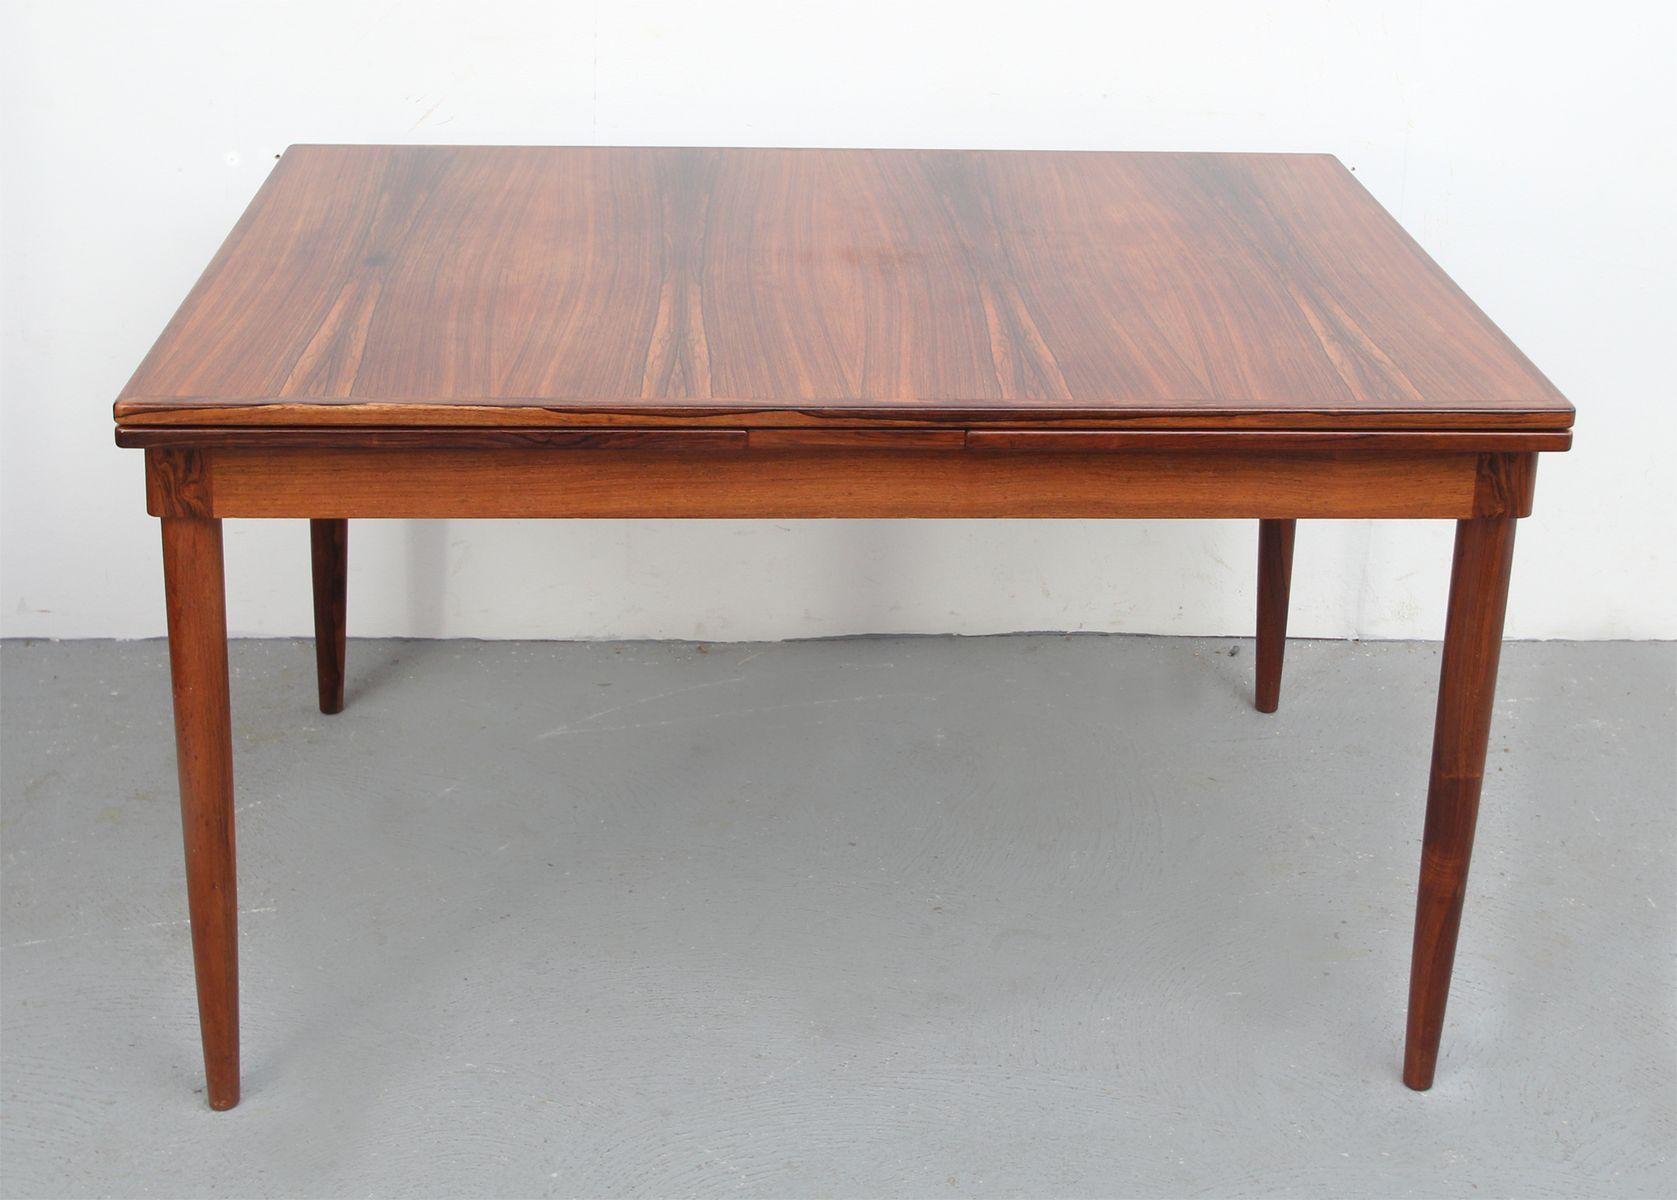 Table de salle manger en palissandre par niels o m ller for Table pour salle a manger design